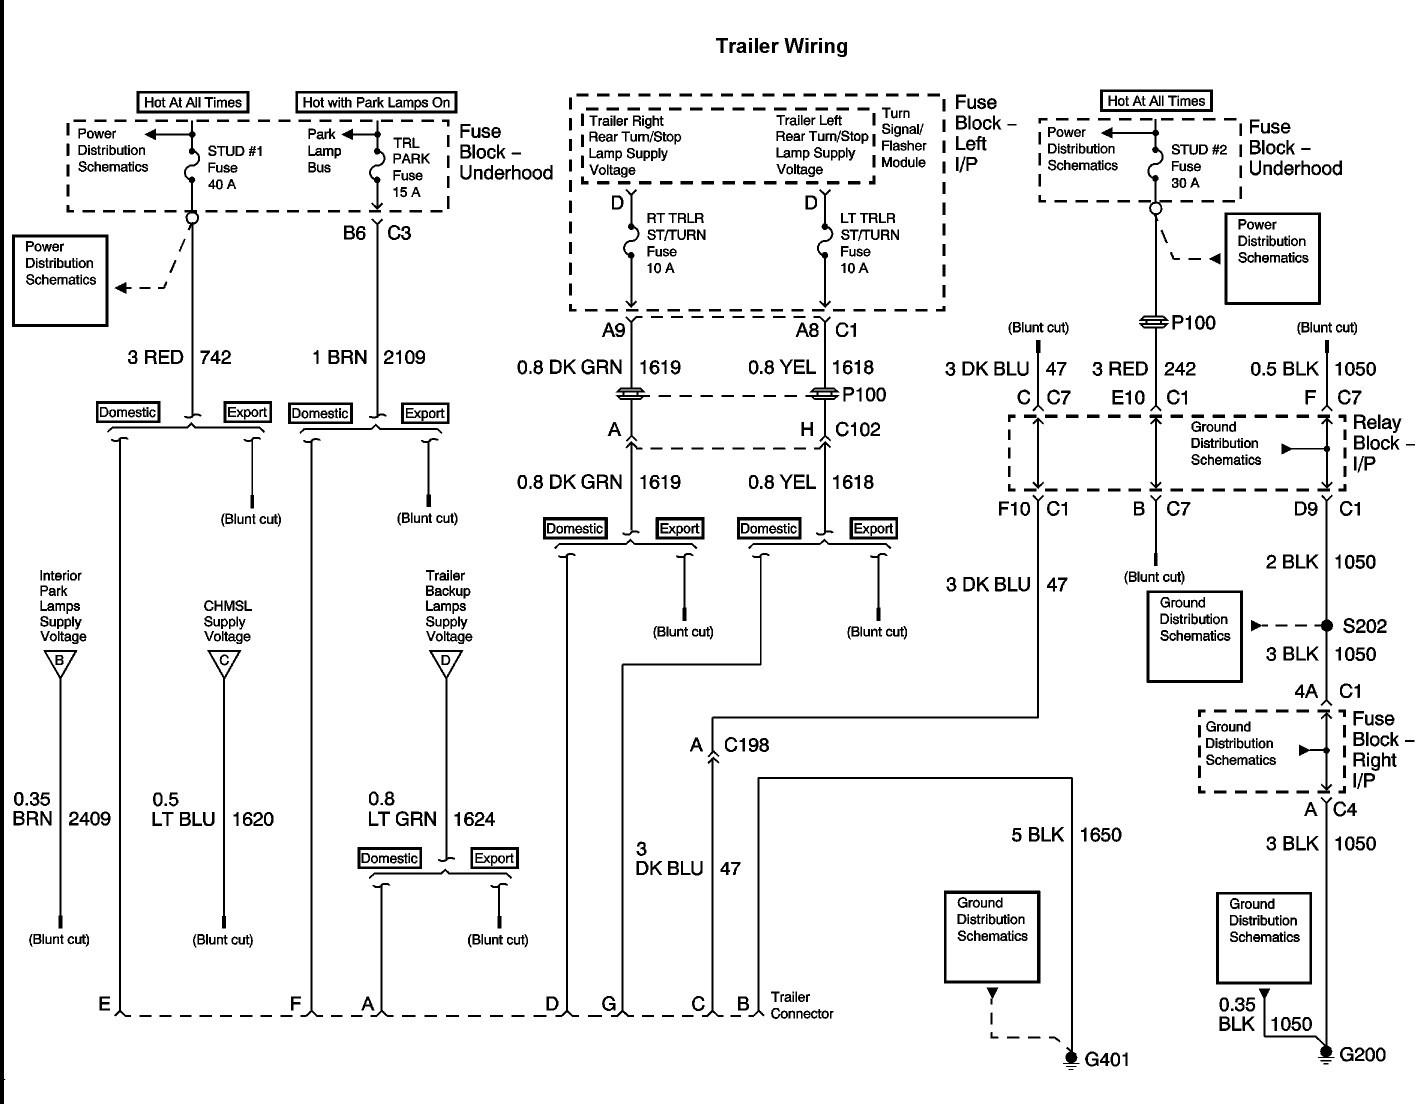 2002 Chevy Trailer Wiring Diagram | Wiring Diagram on 2011 chevy tahoe wiring diagram, 2008 chevy avalanche fuse box diagram, 2002 chevy avalanche wiring diagram, 2005 chevy avalanche wiring diagram, 2008 chevy avalanche 6 inch lift, 2004 chevy avalanche wiring diagram, 2008 chevy avalanche belt diagram, 2008 chevy avalanche parts diagram,